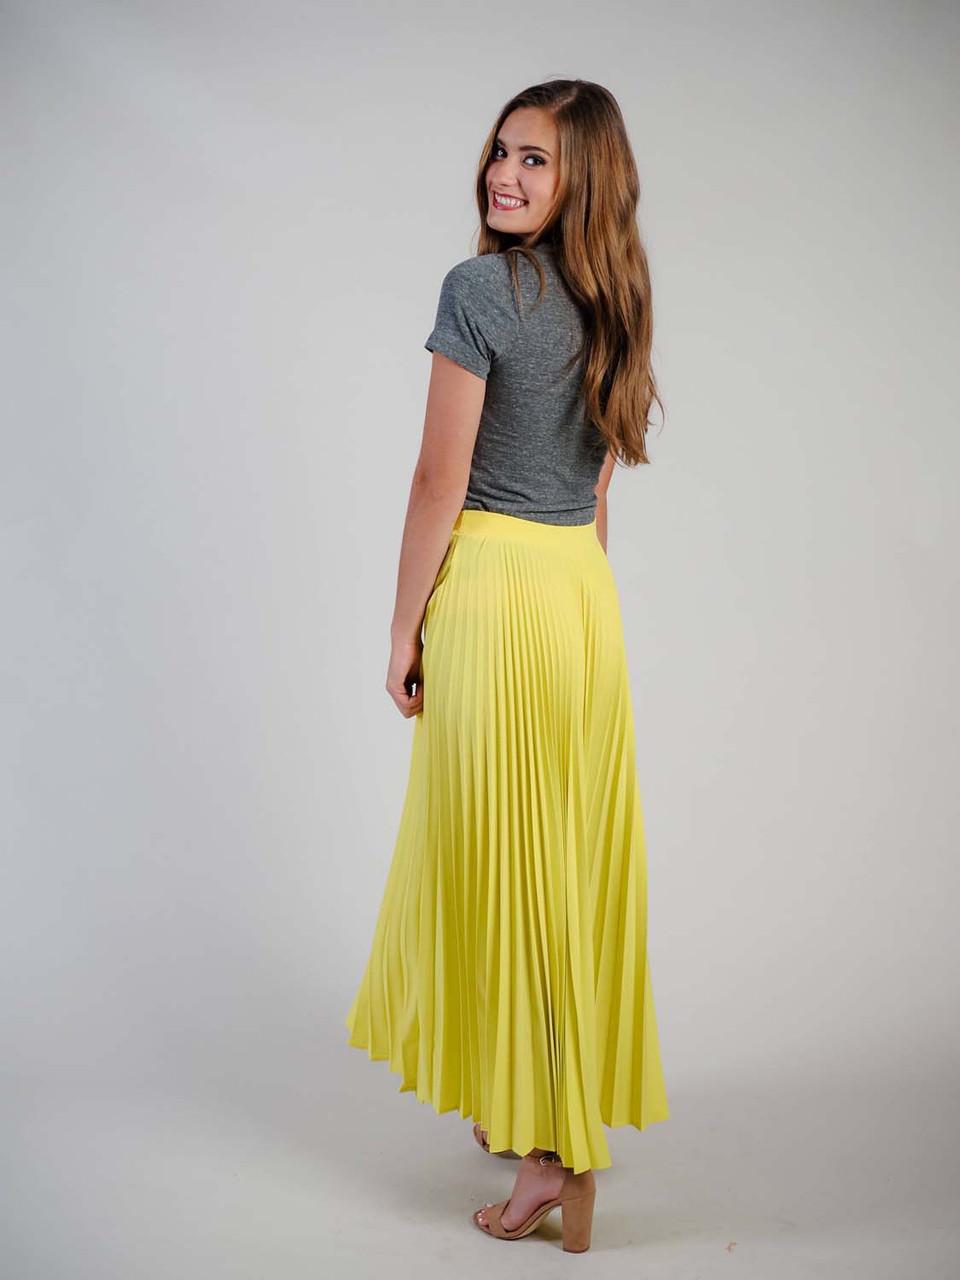 long neon yellow pleated skirt